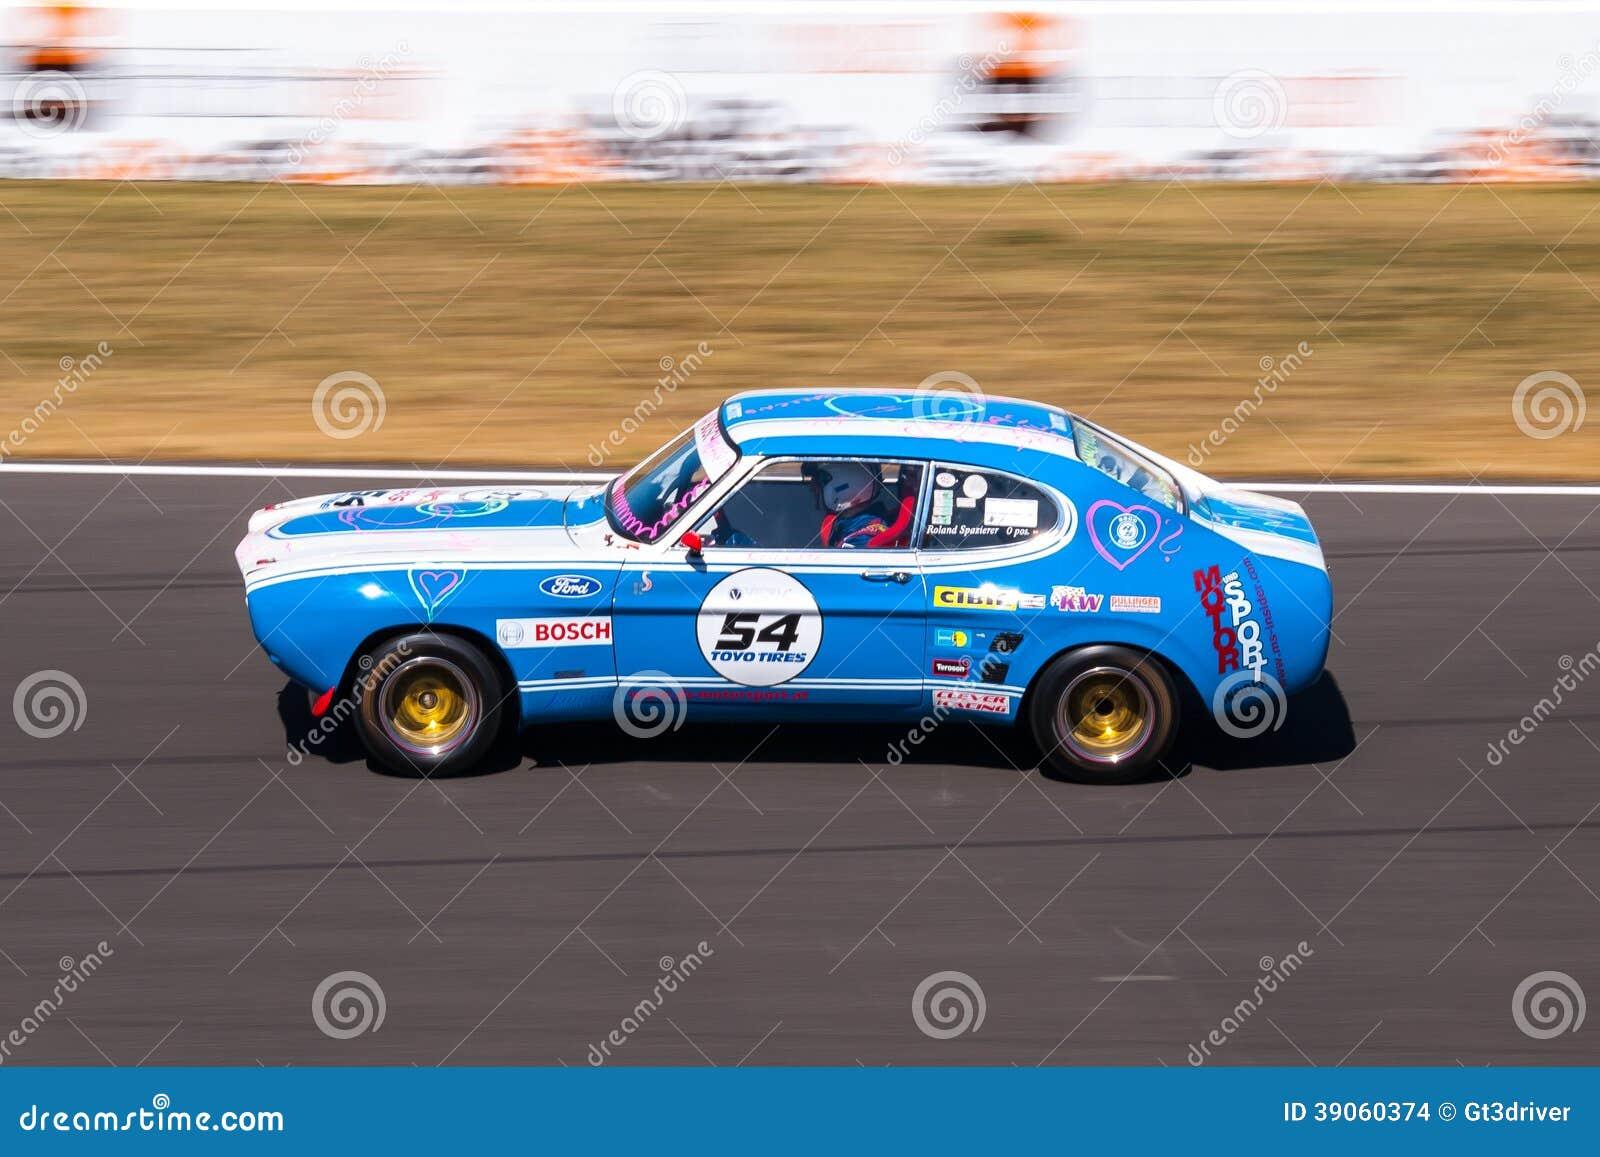 capri car classic ford histocup race ... & Classic Ford Capri Race Car Editorial Stock Image - Image: 39060374 markmcfarlin.com